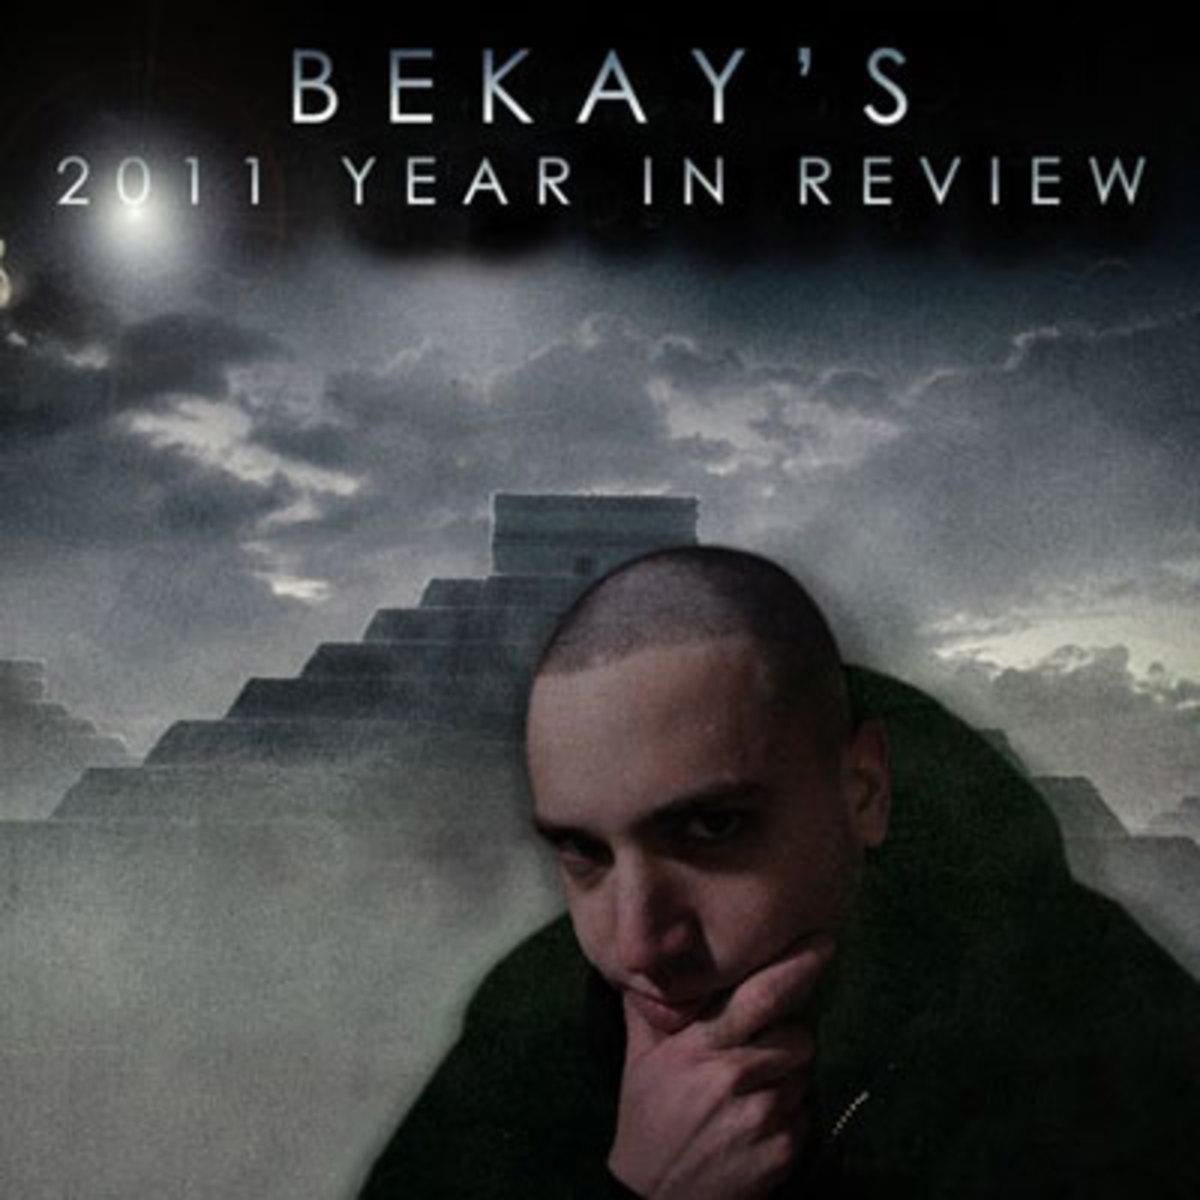 bekay-2011yearreview.jpg